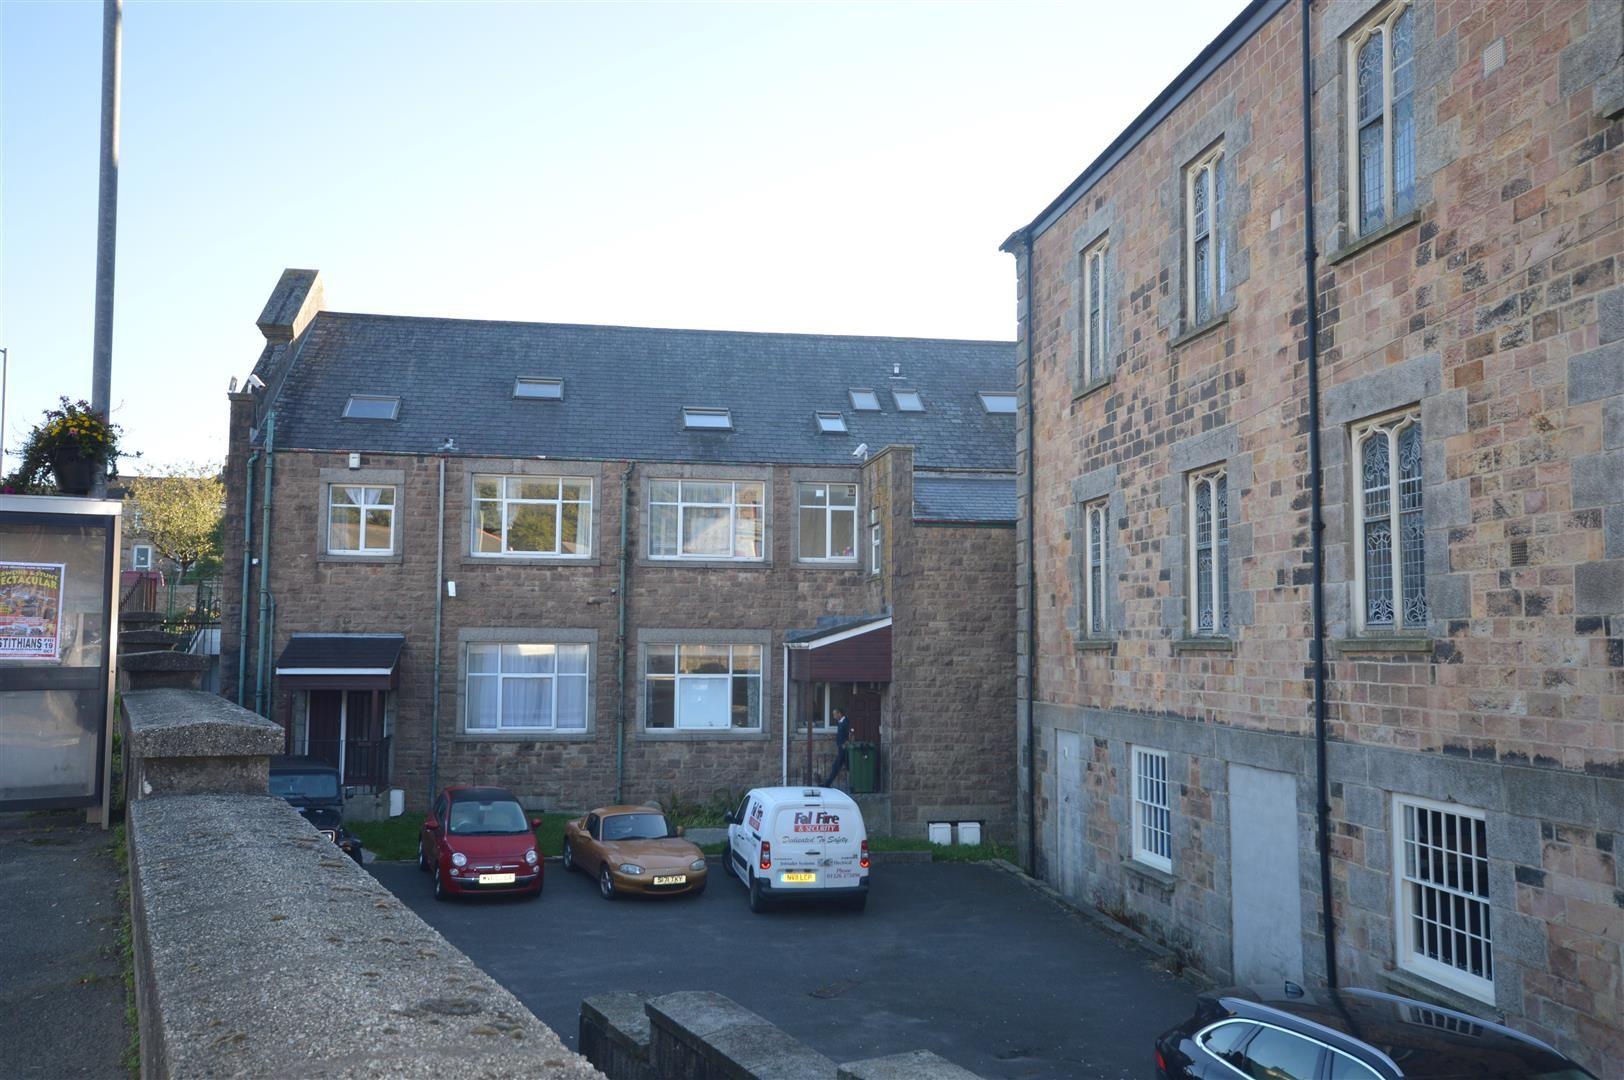 Property photo 1 of 6. Dsc_0009.Jpg